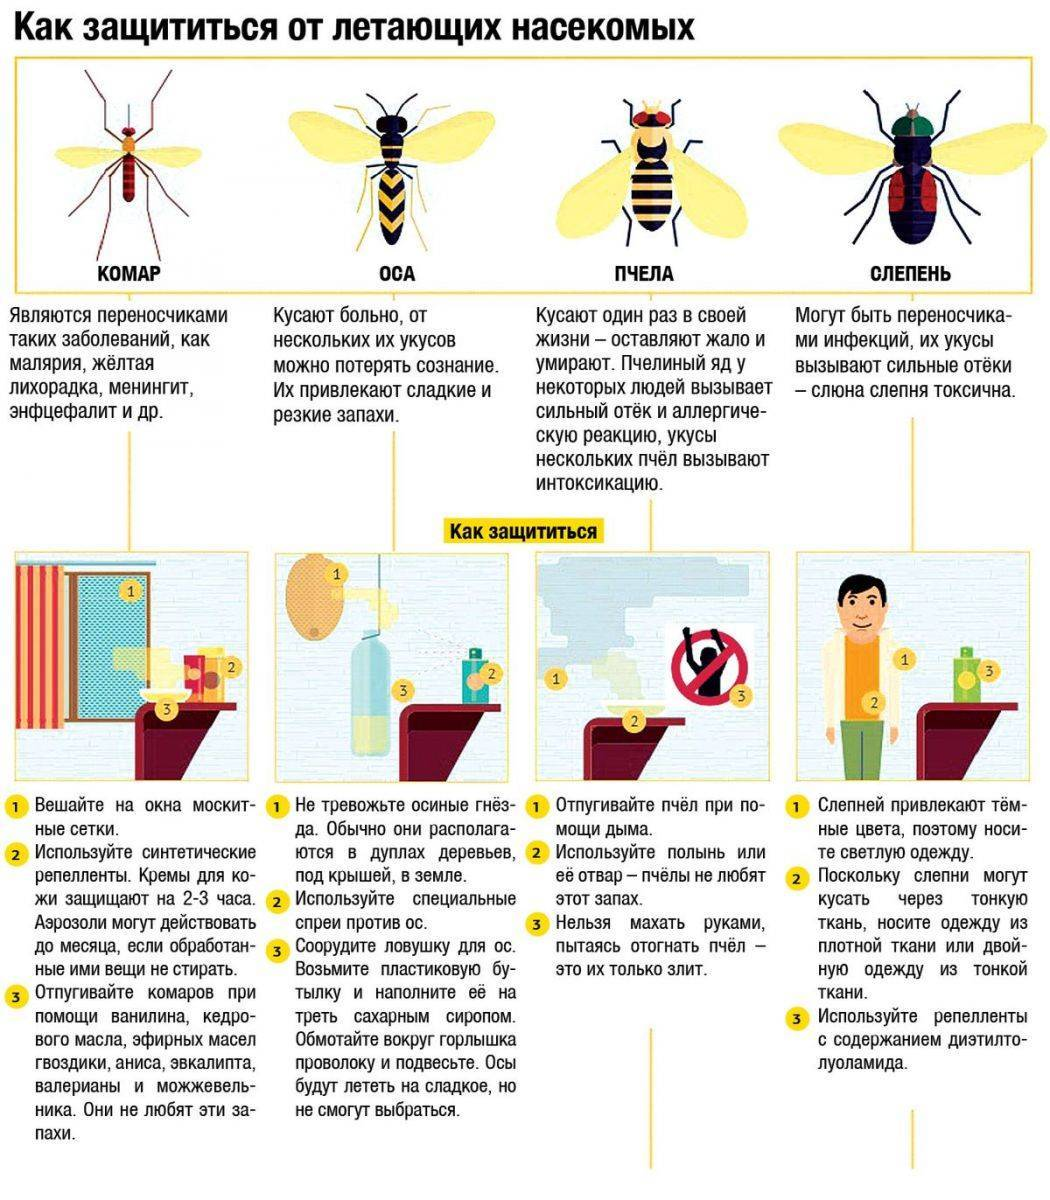 Кто умирает после укуса пчела или оса